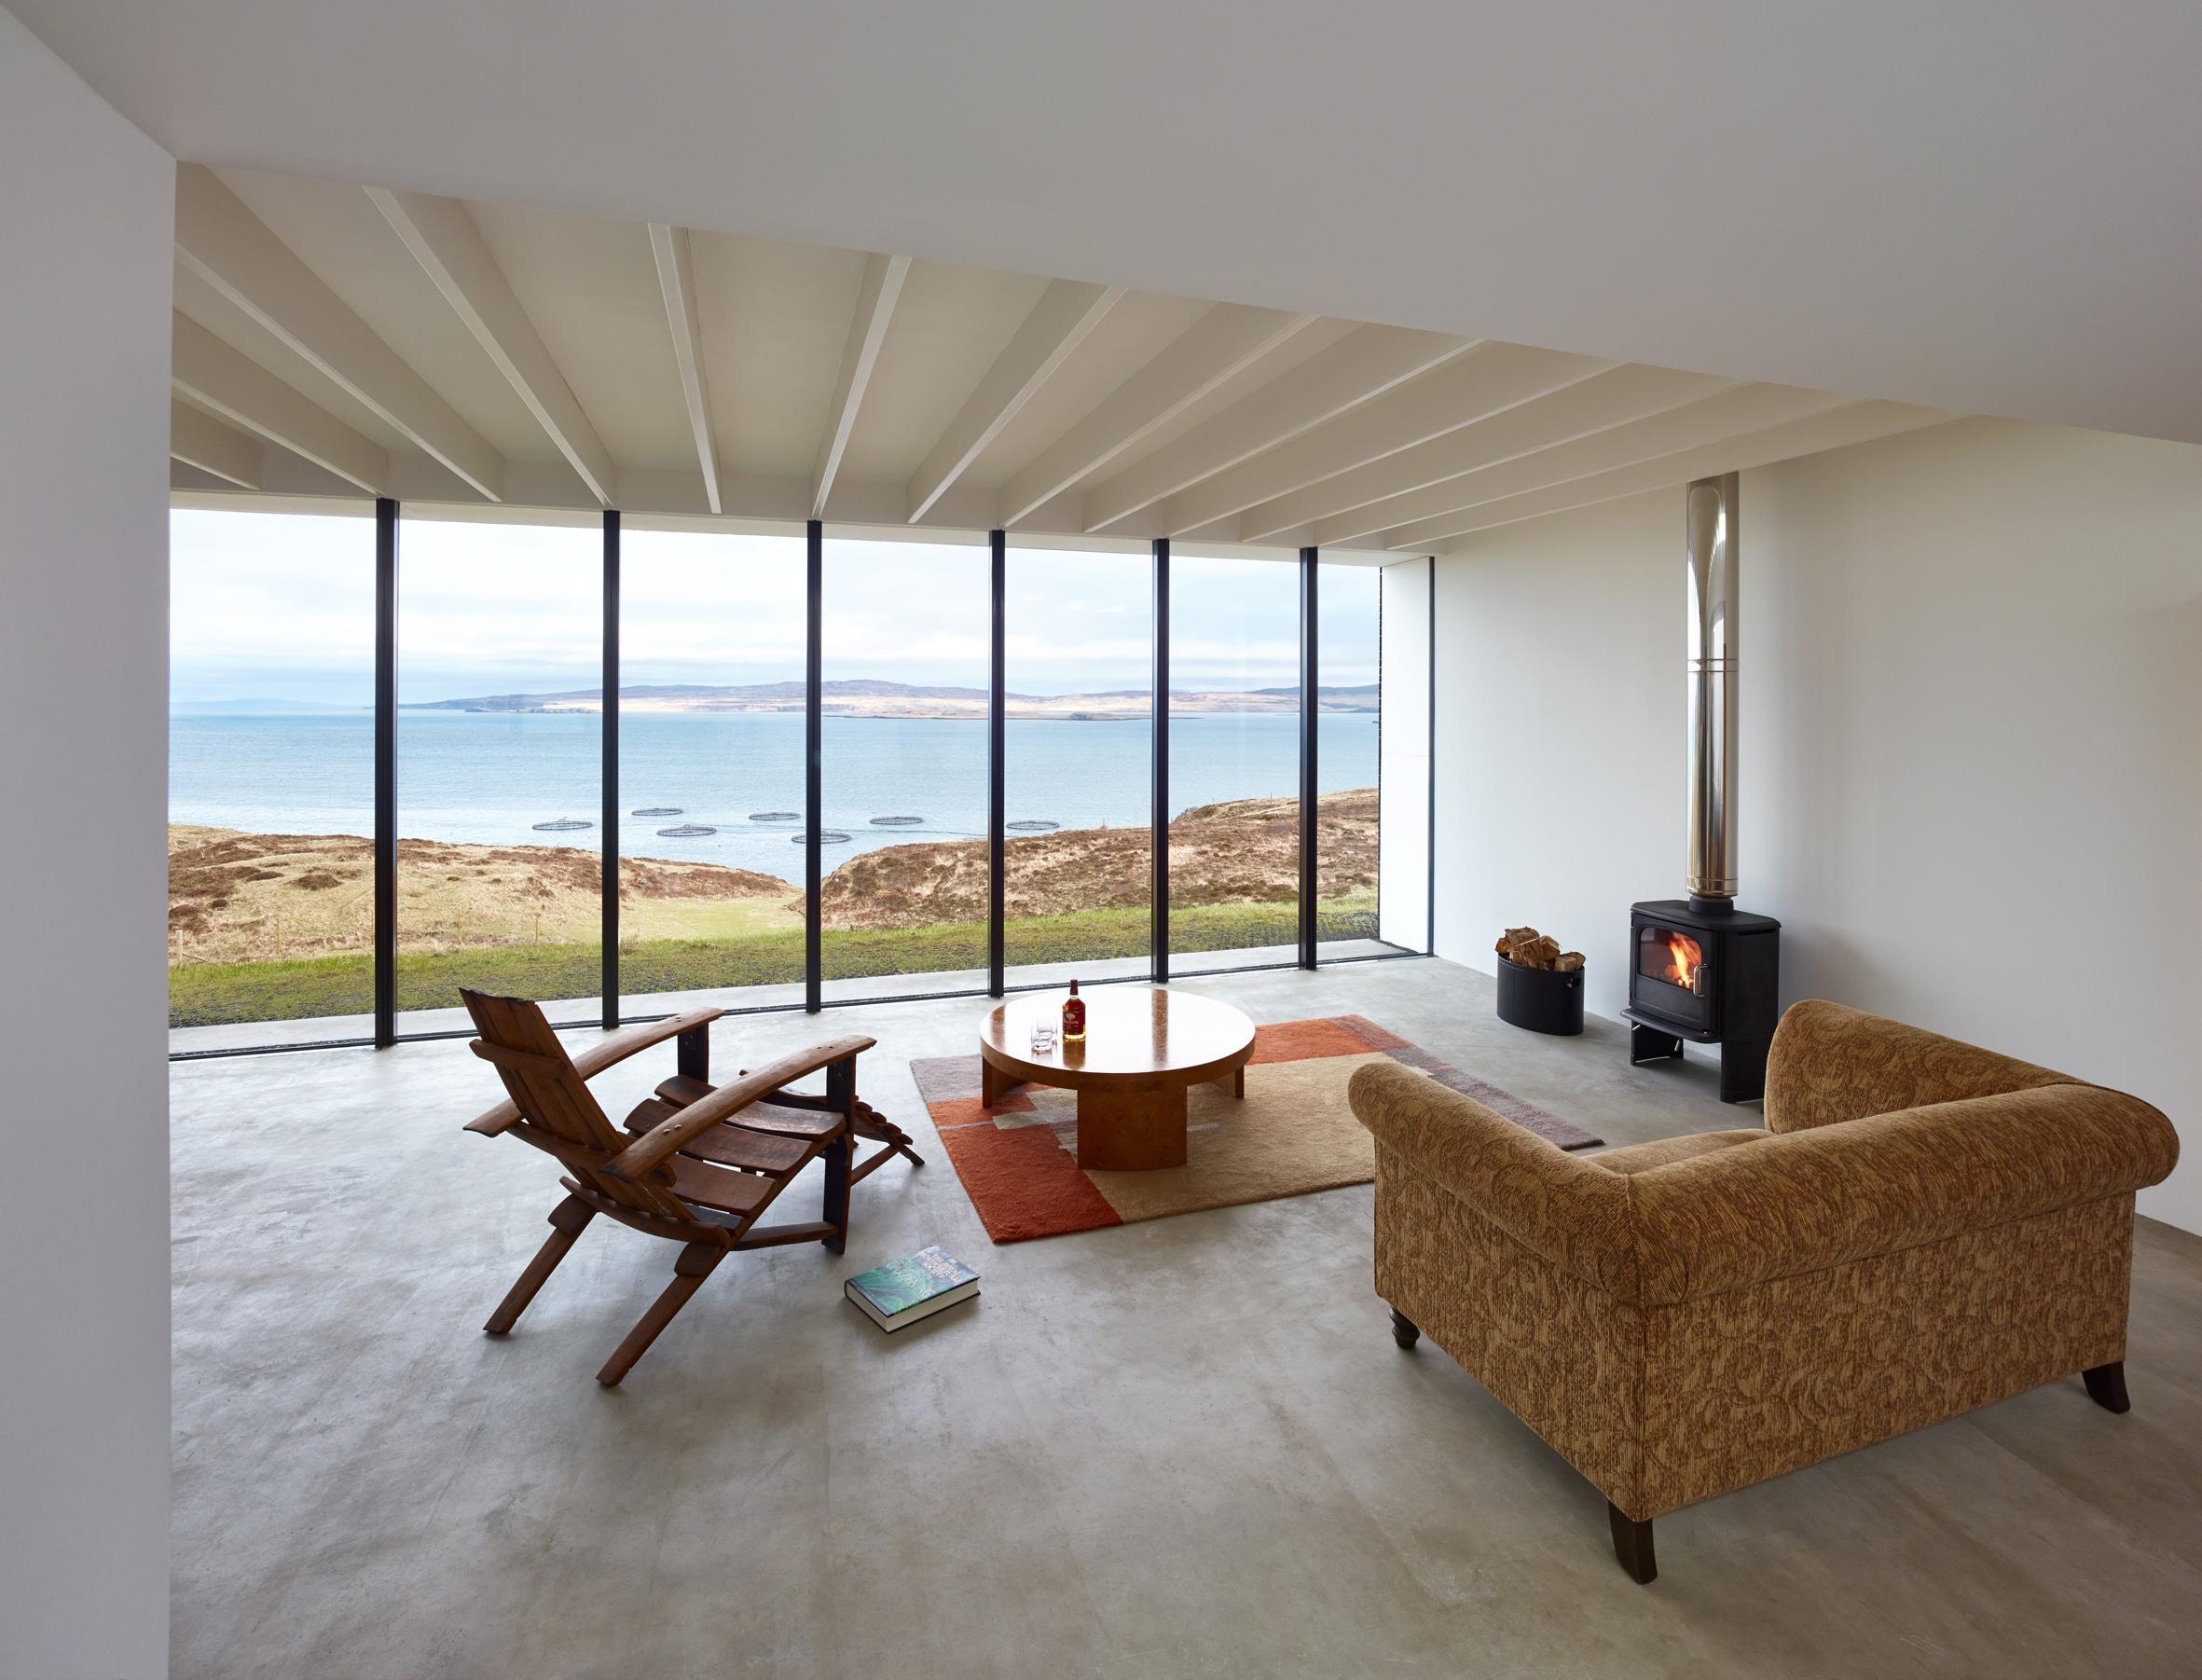 gelber sessel bilder ideen couchstyle. Black Bedroom Furniture Sets. Home Design Ideas